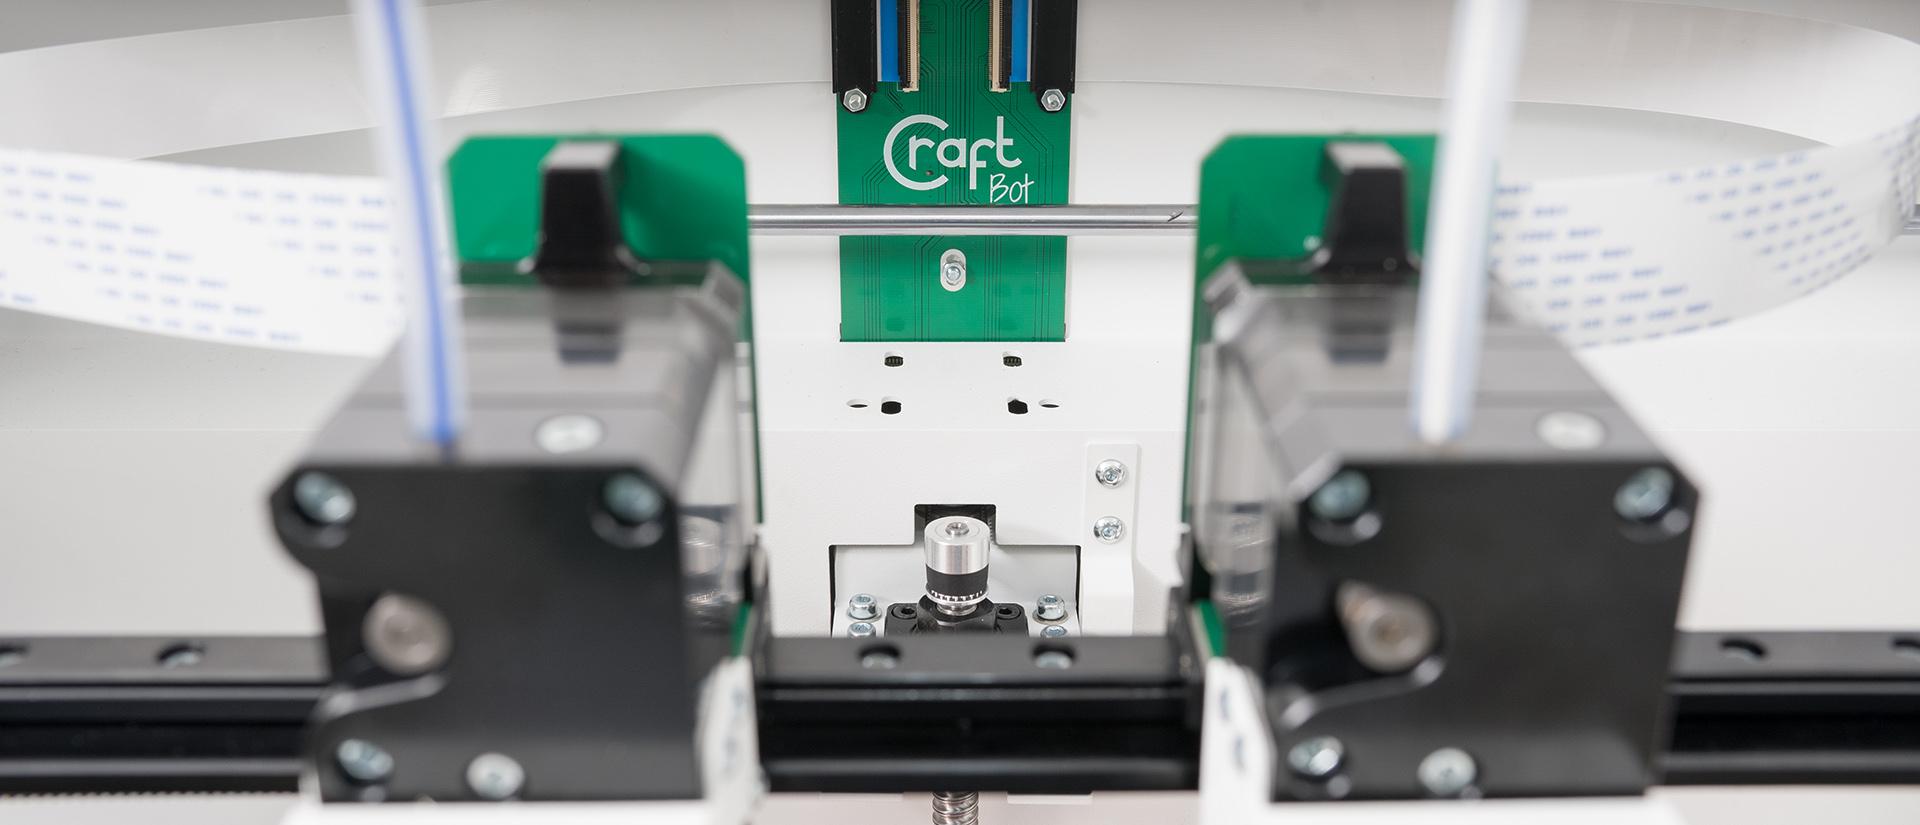 Inside the dual extruder CraftBot Flow IDEX 3D printer. Photo via CraftUnique.